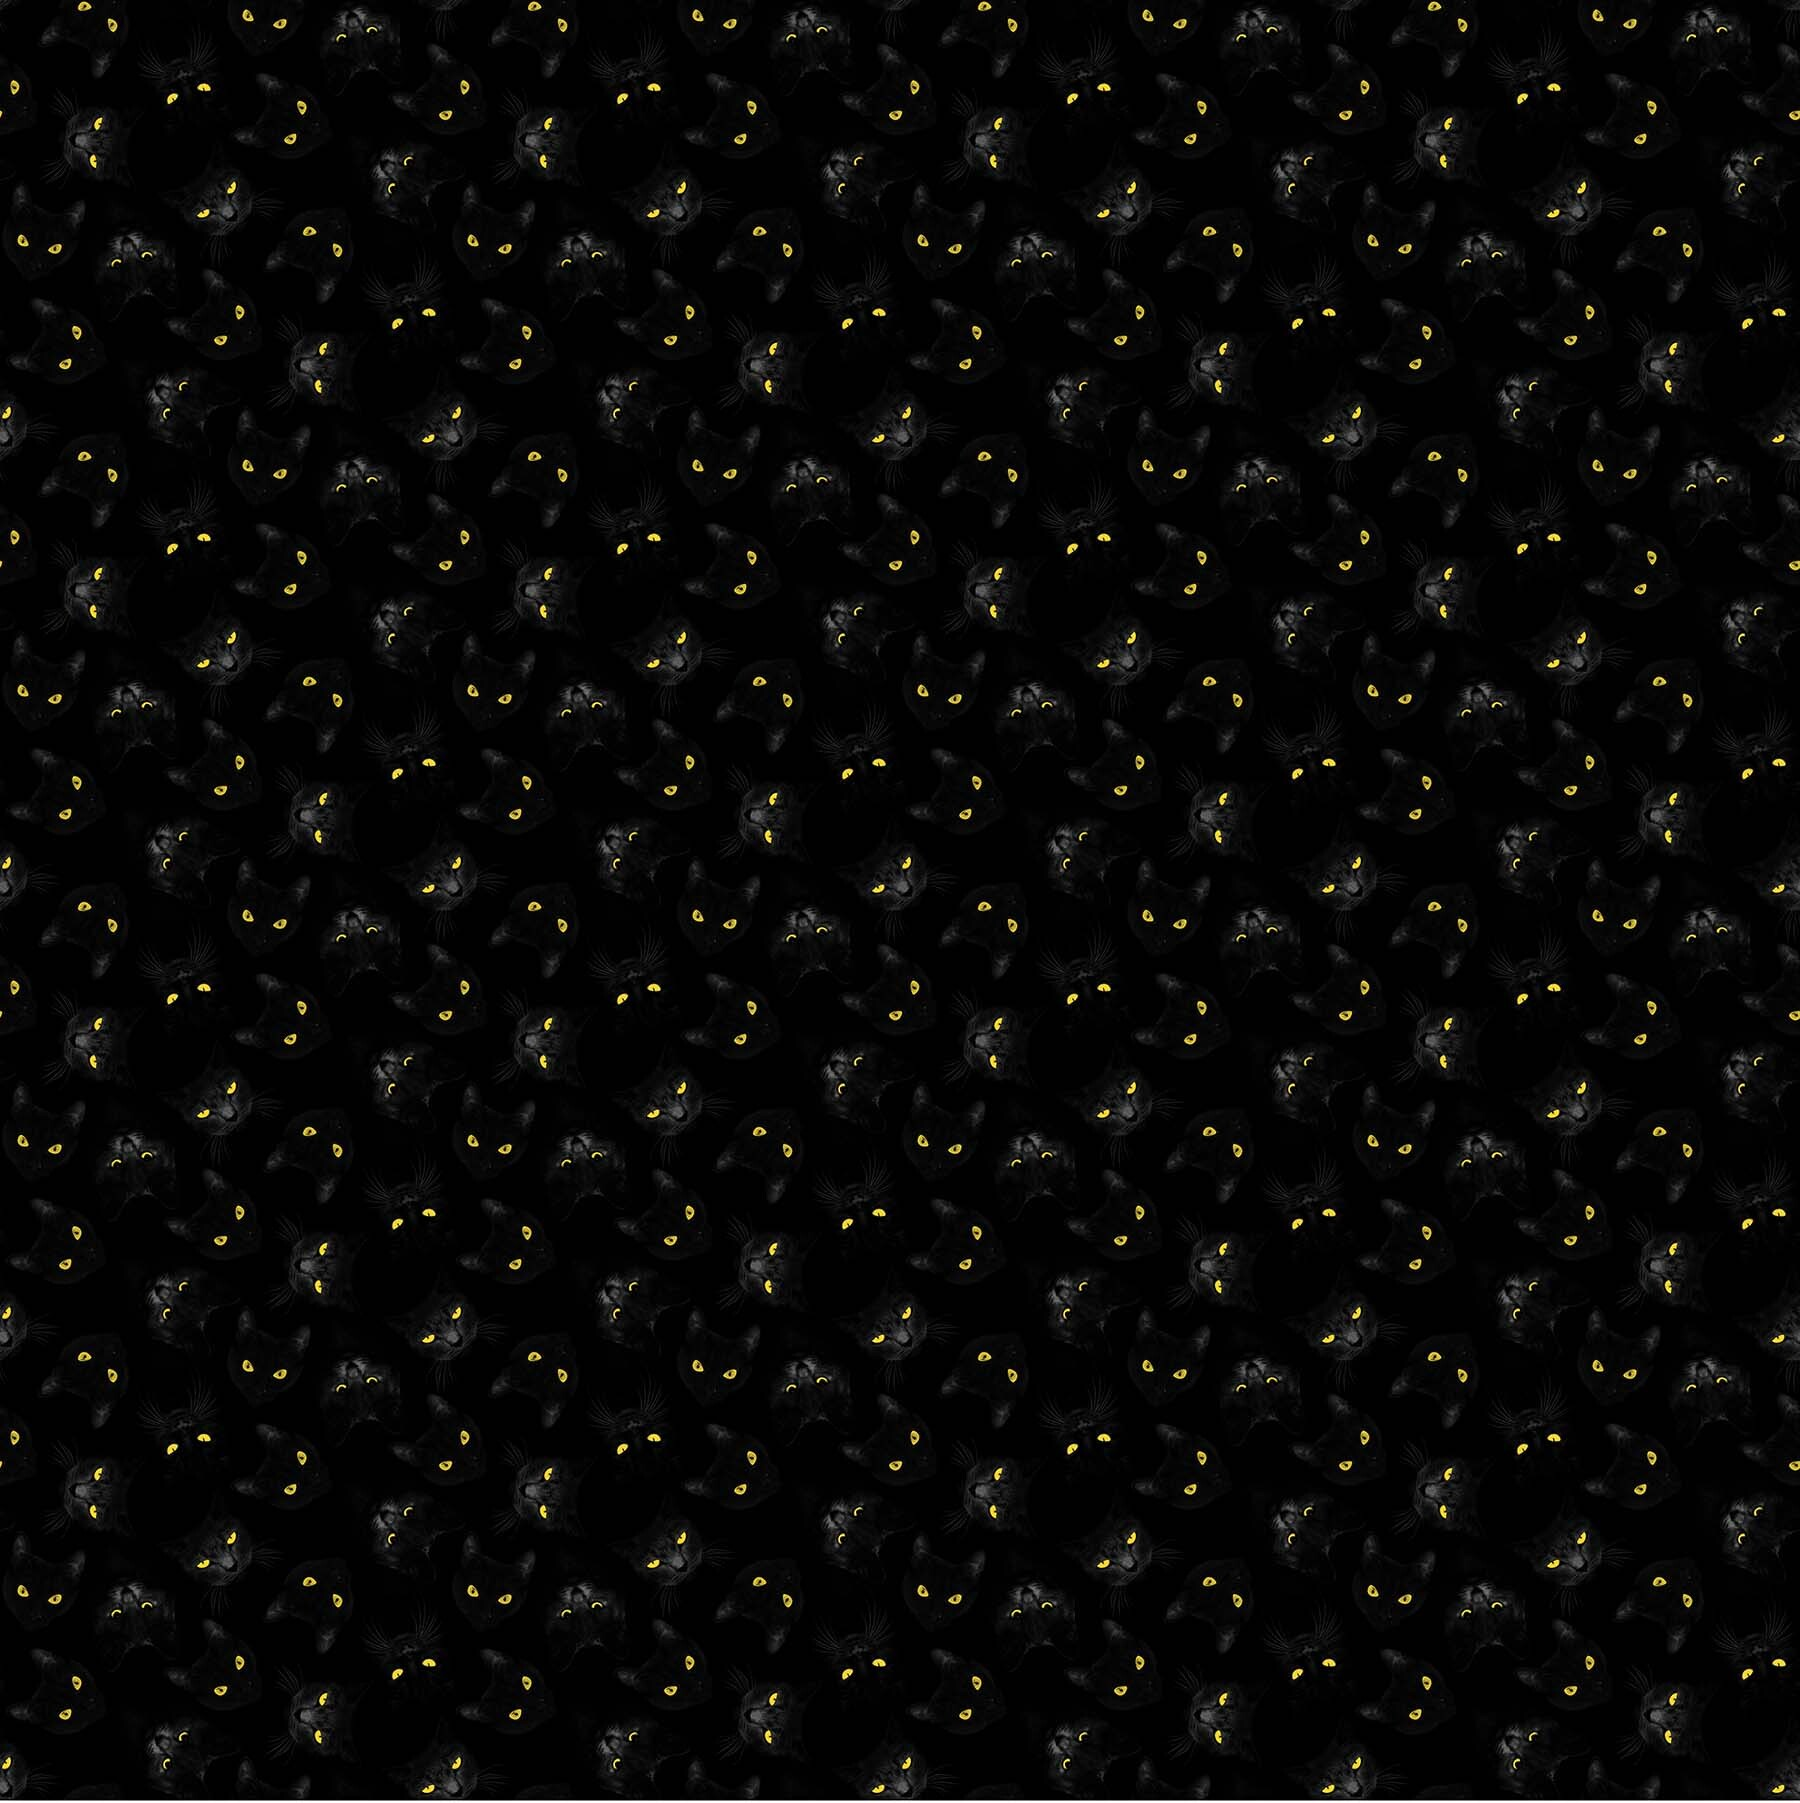 Black Cat Capers - Cat Eyes - 1/2m cut 57890